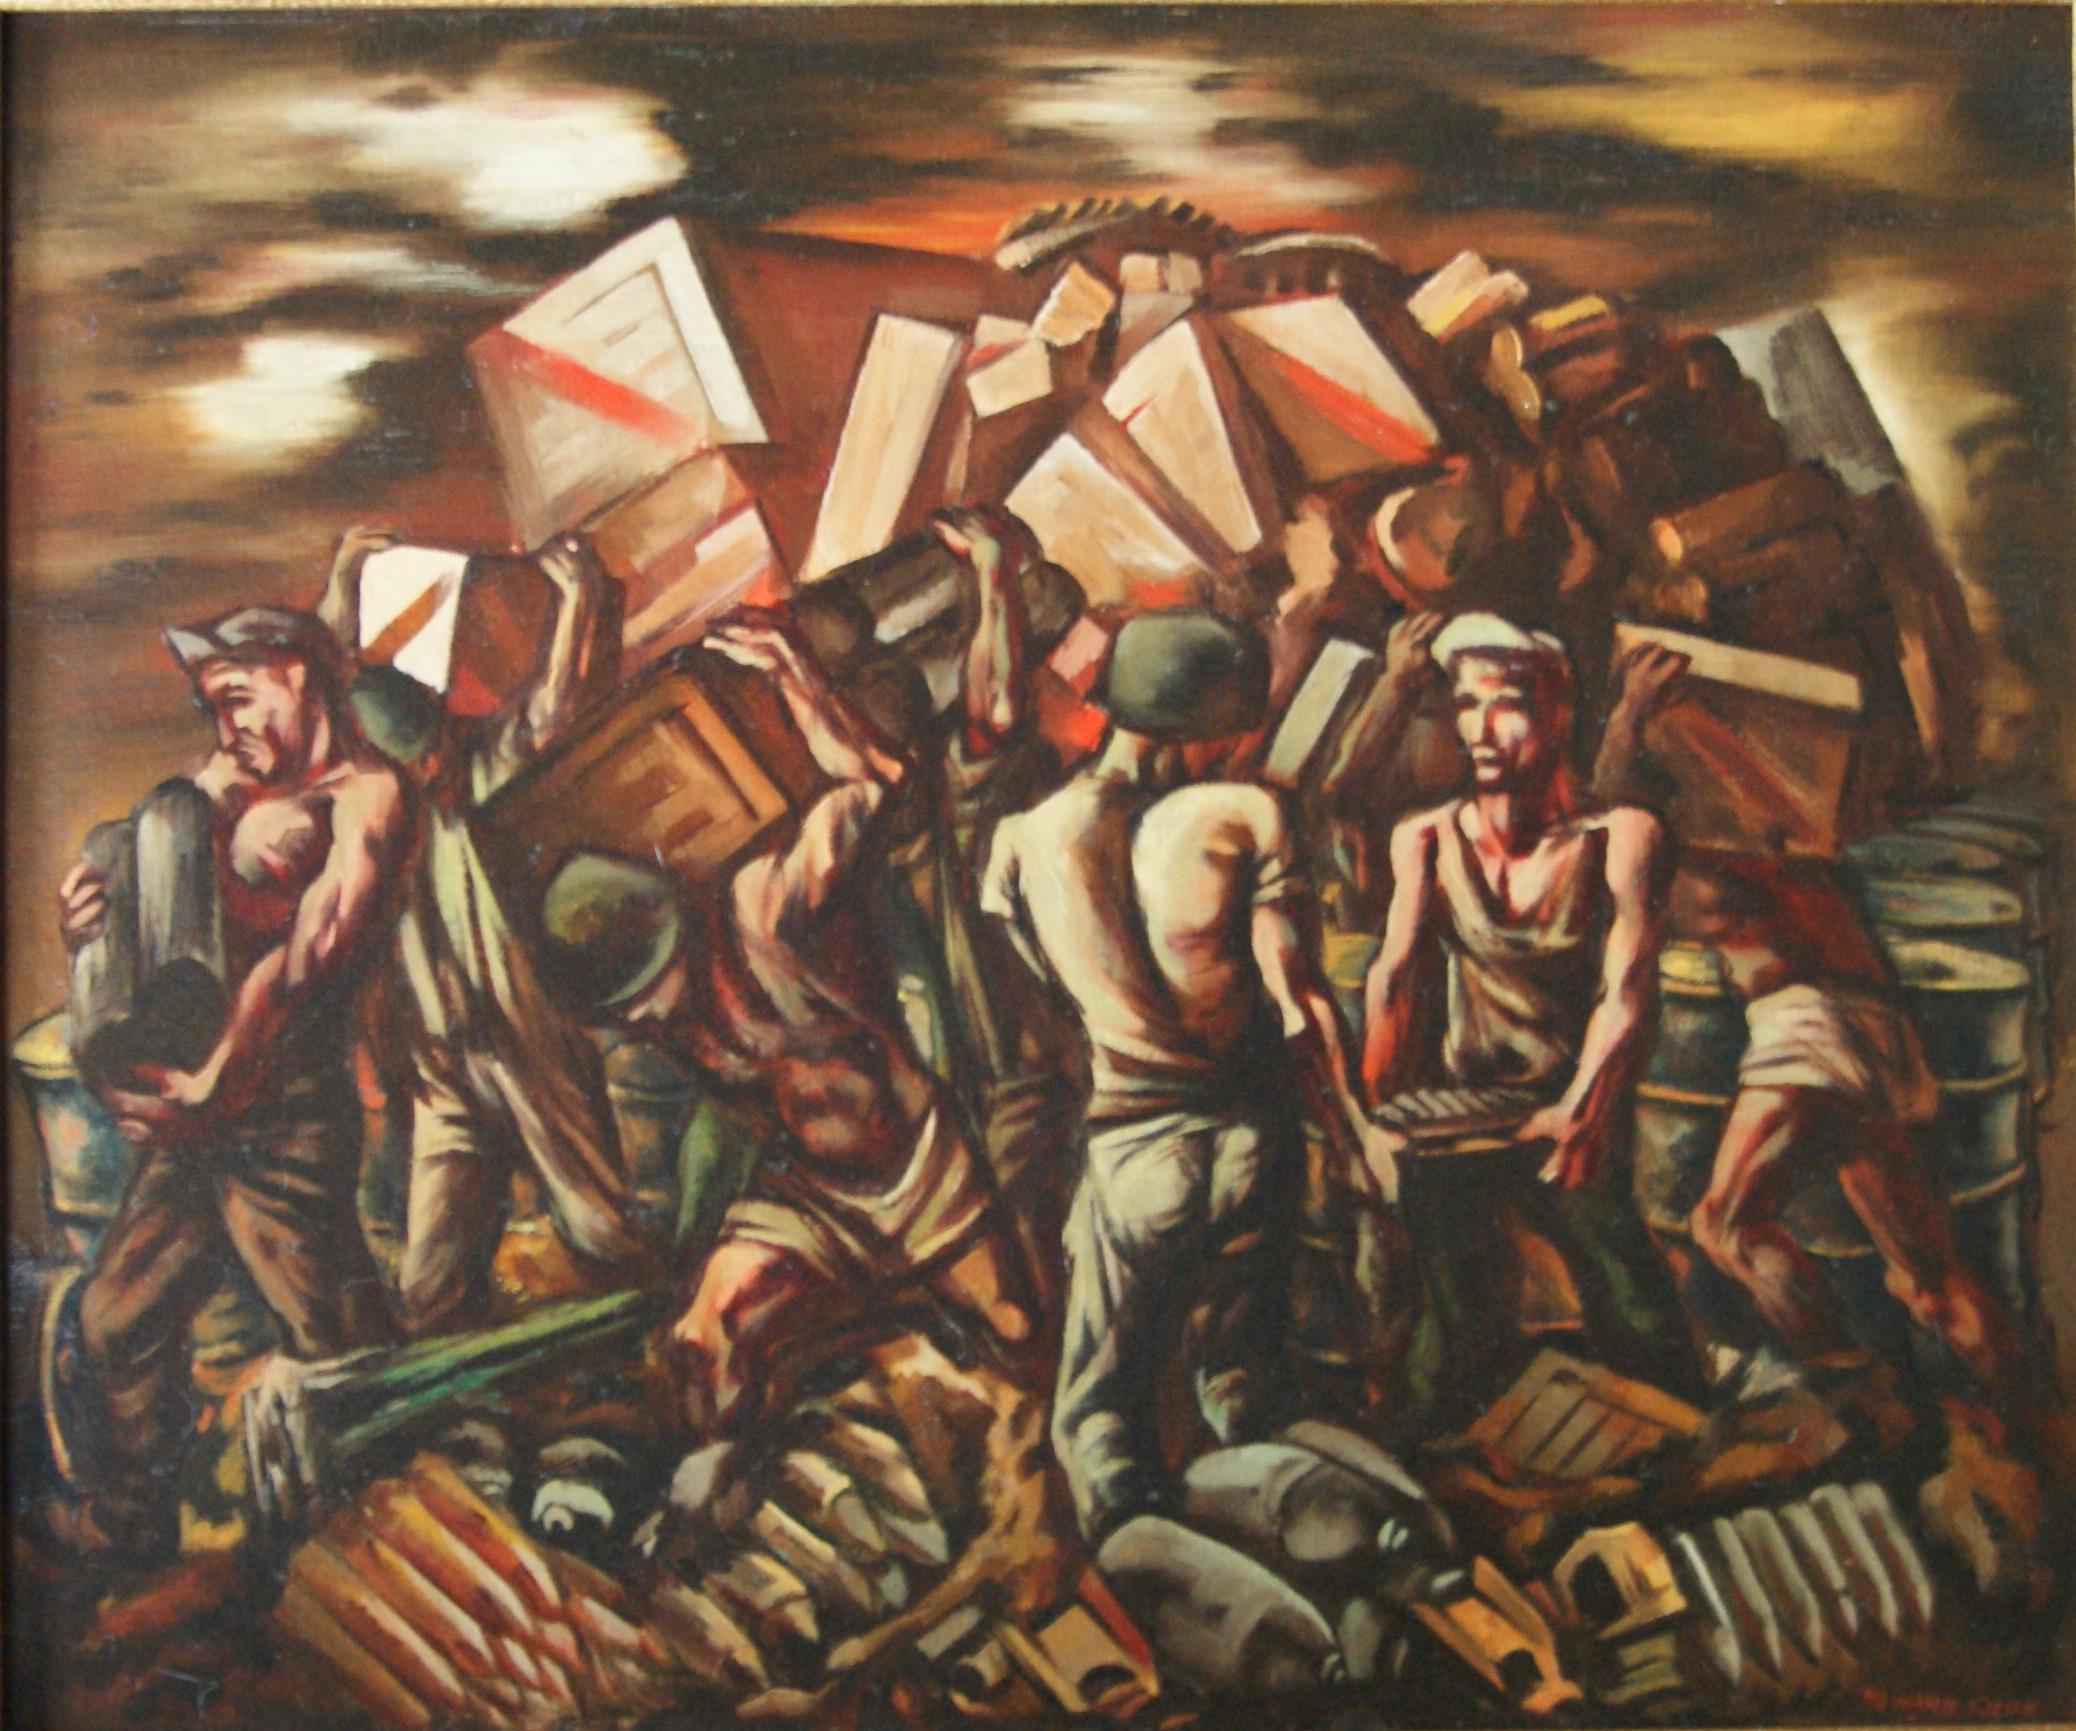 MILITARY MUNITIONS American Modernism WPA World War II Modern Realism Historical